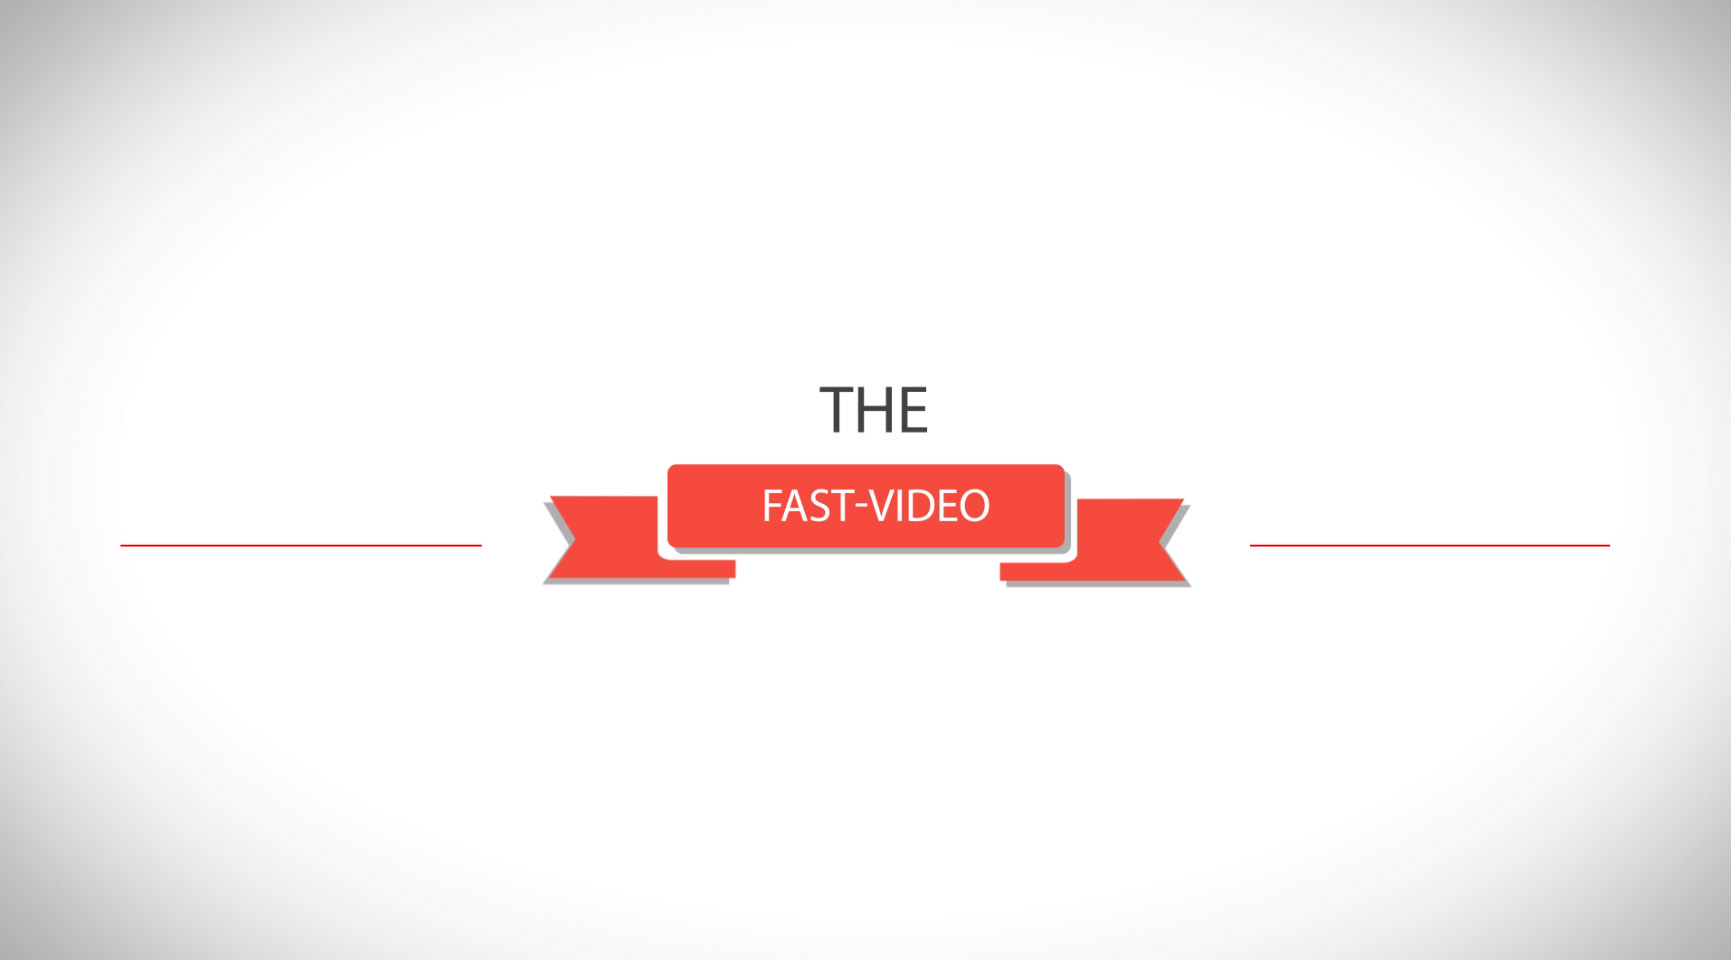 Fast video